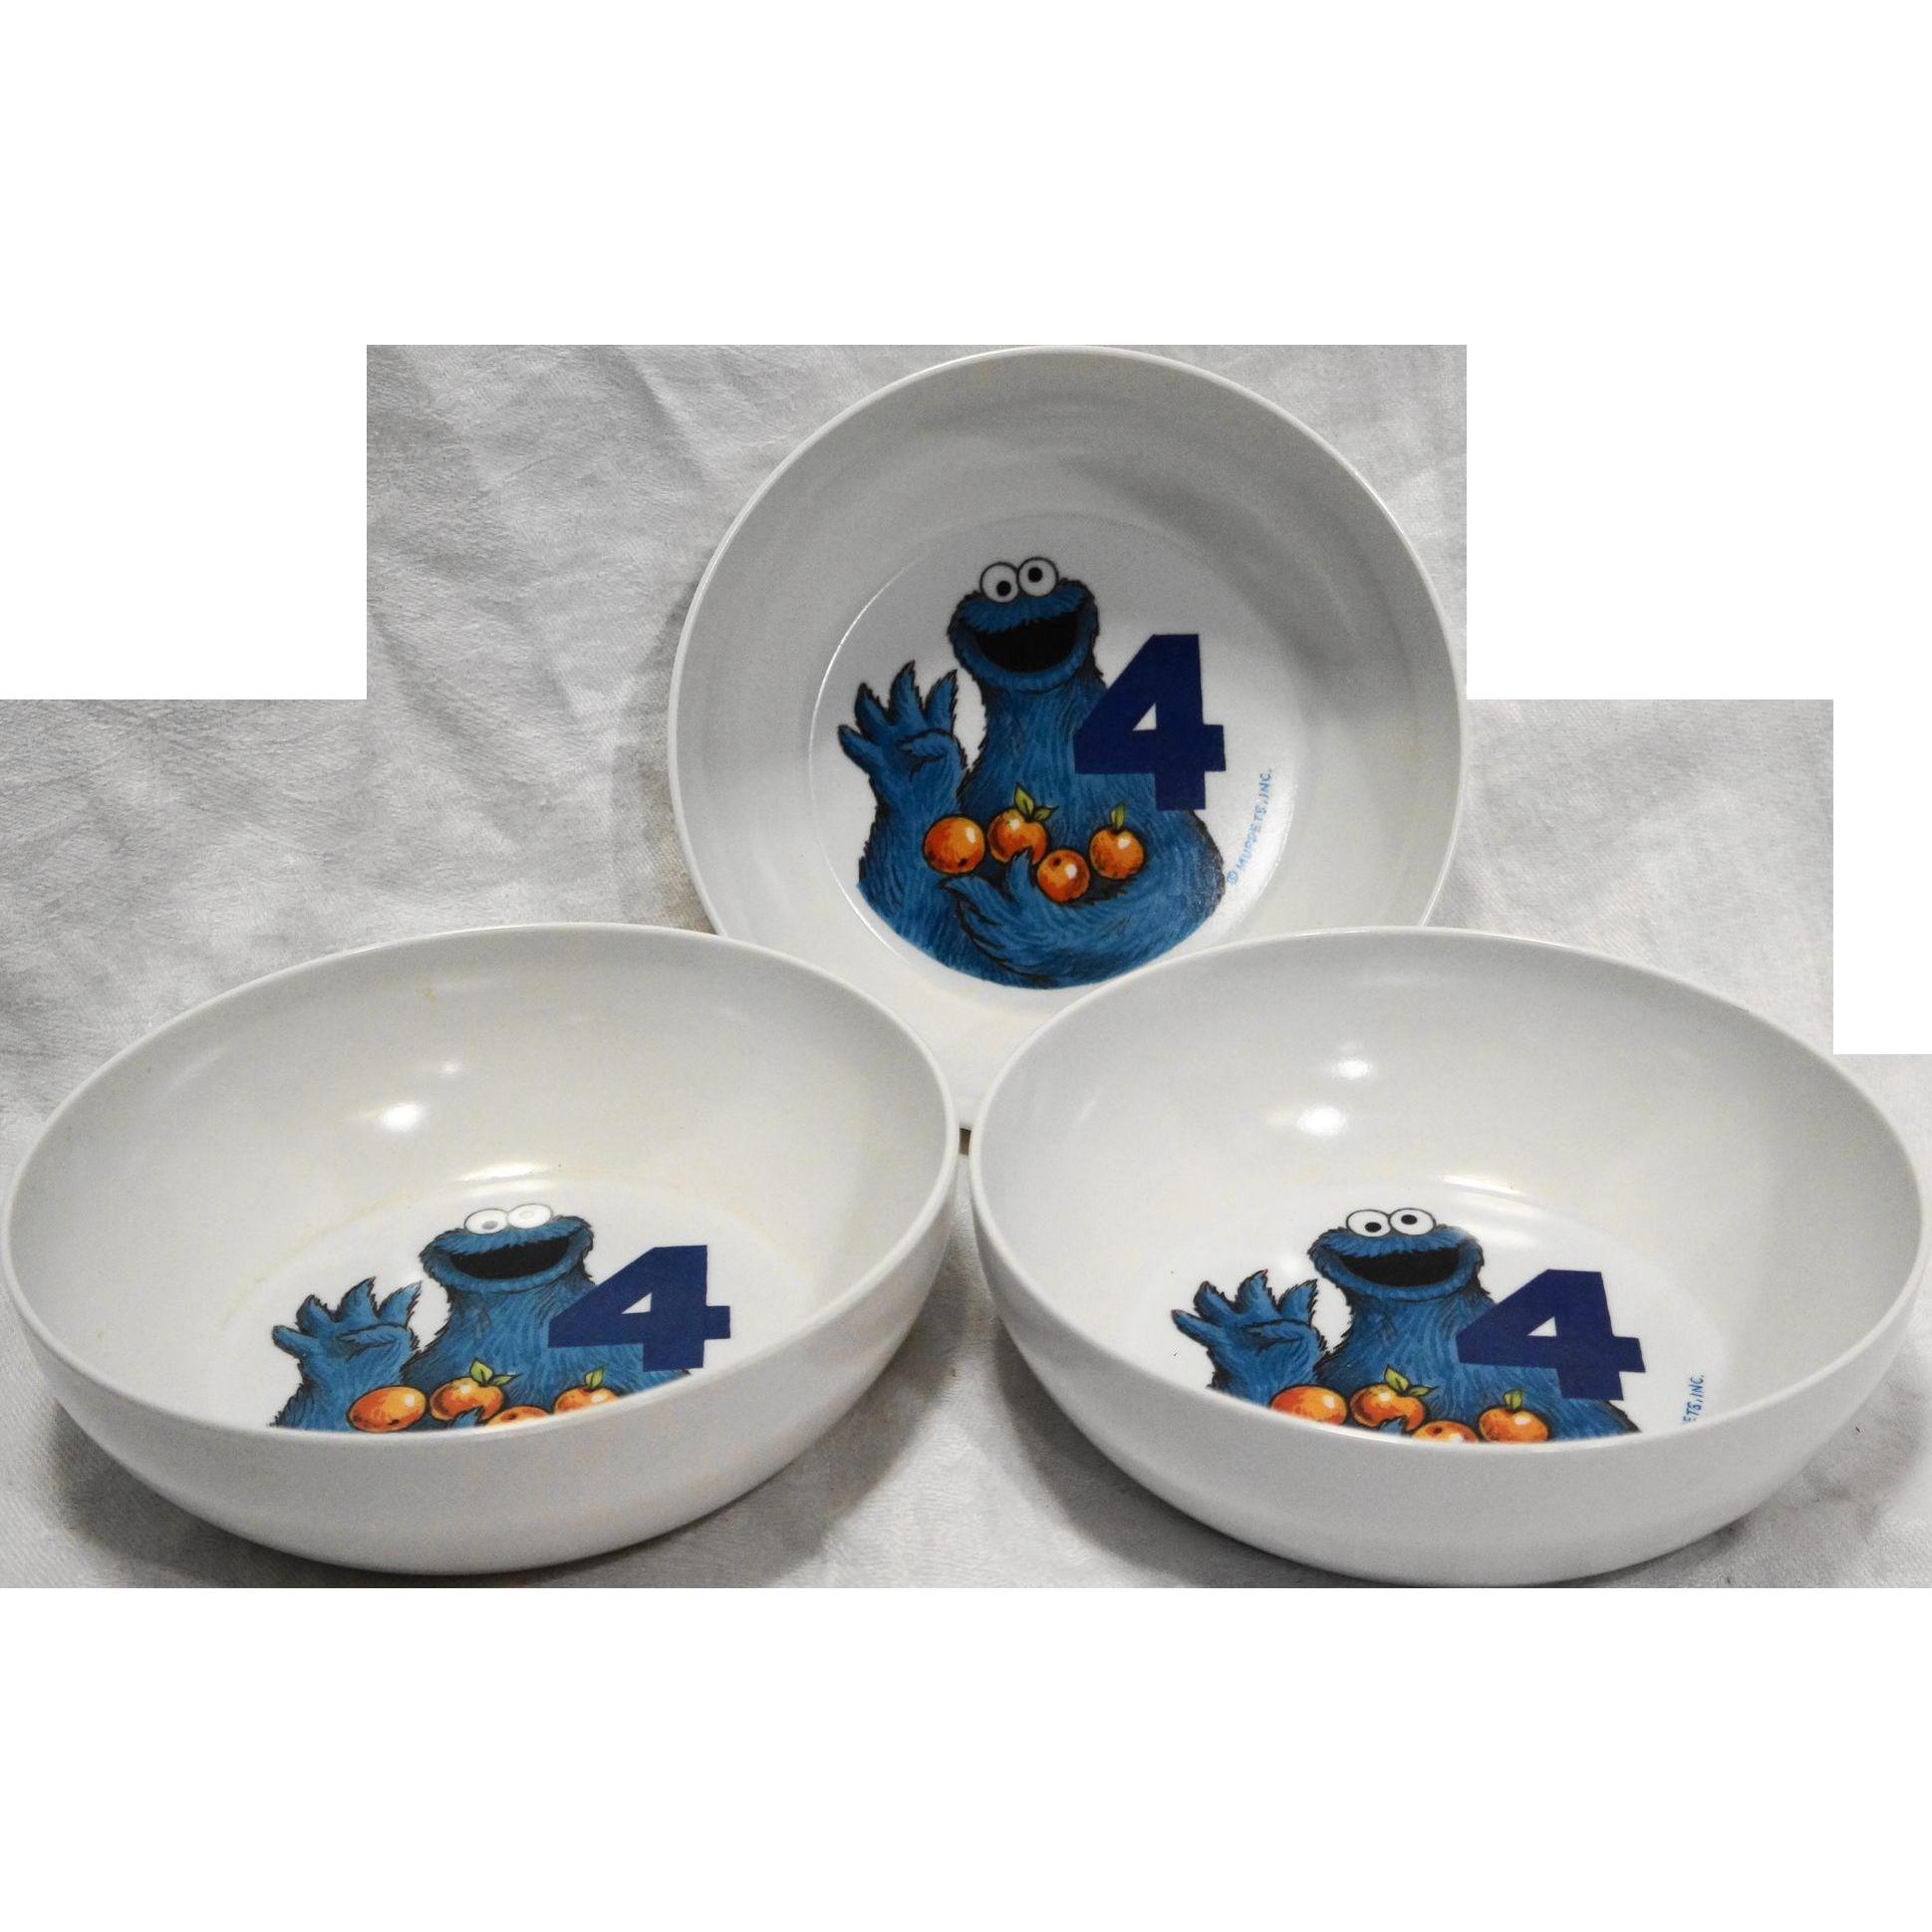 Cookie Monster Cereal Bowls Melmac Set of 3 Sesame Street Muppets